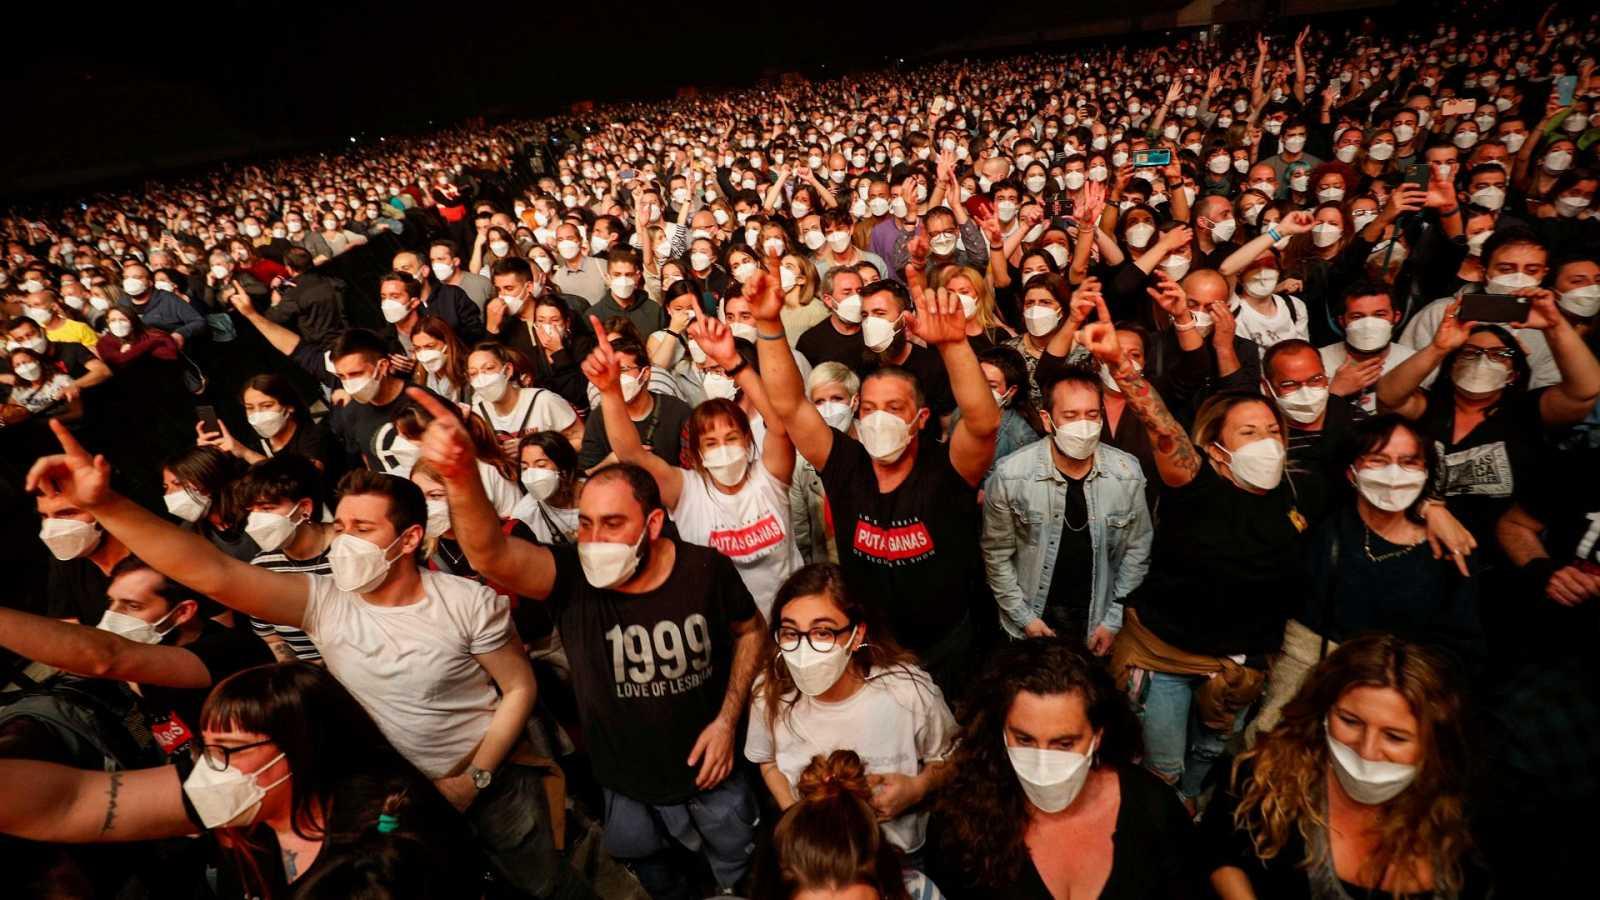 concierto en pandemia Love of Lesbian